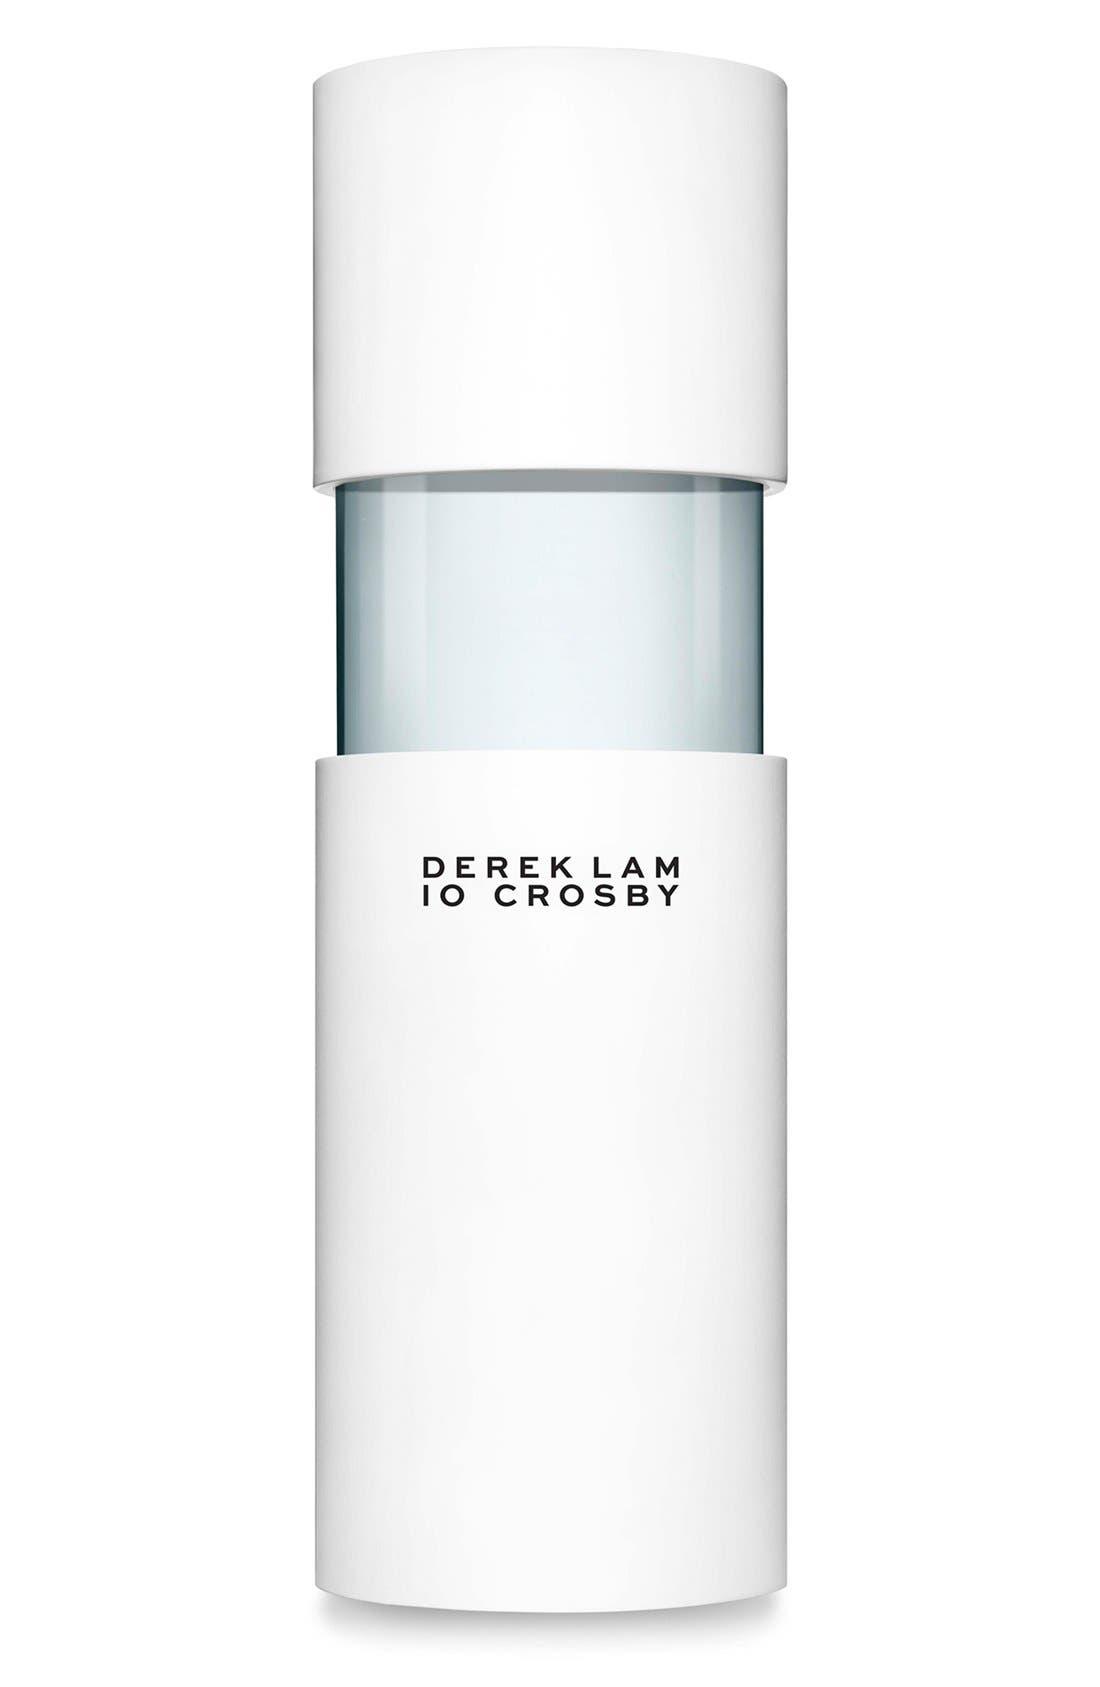 Derek Lam 10 Crosby 'Ellipsis' Eau de Parfum